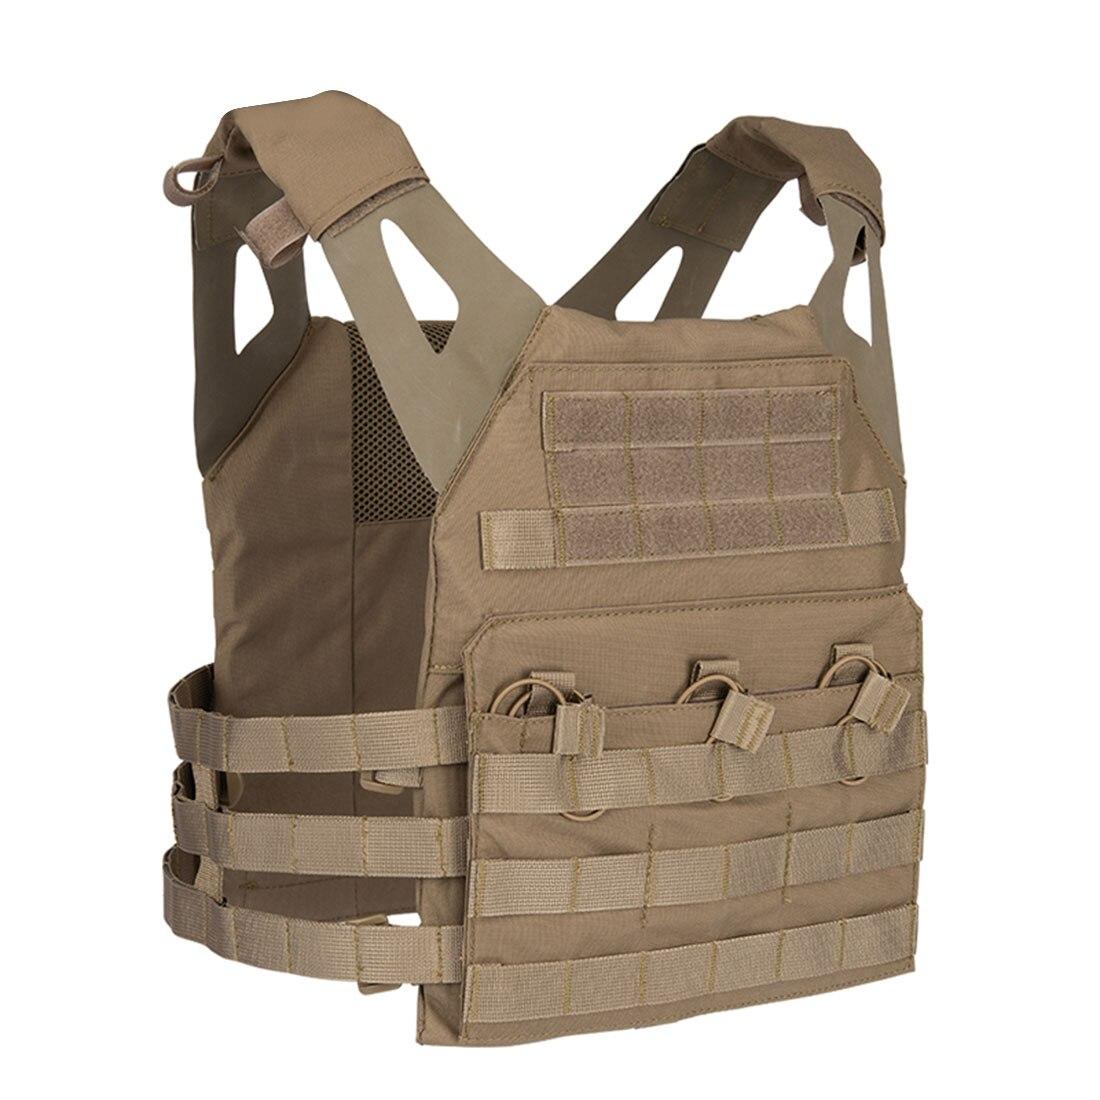 Chaleco táctico JPC, chaleco resistente al agua antiarañazos, accesorios militares para actividades al aire libre, bronceado negro